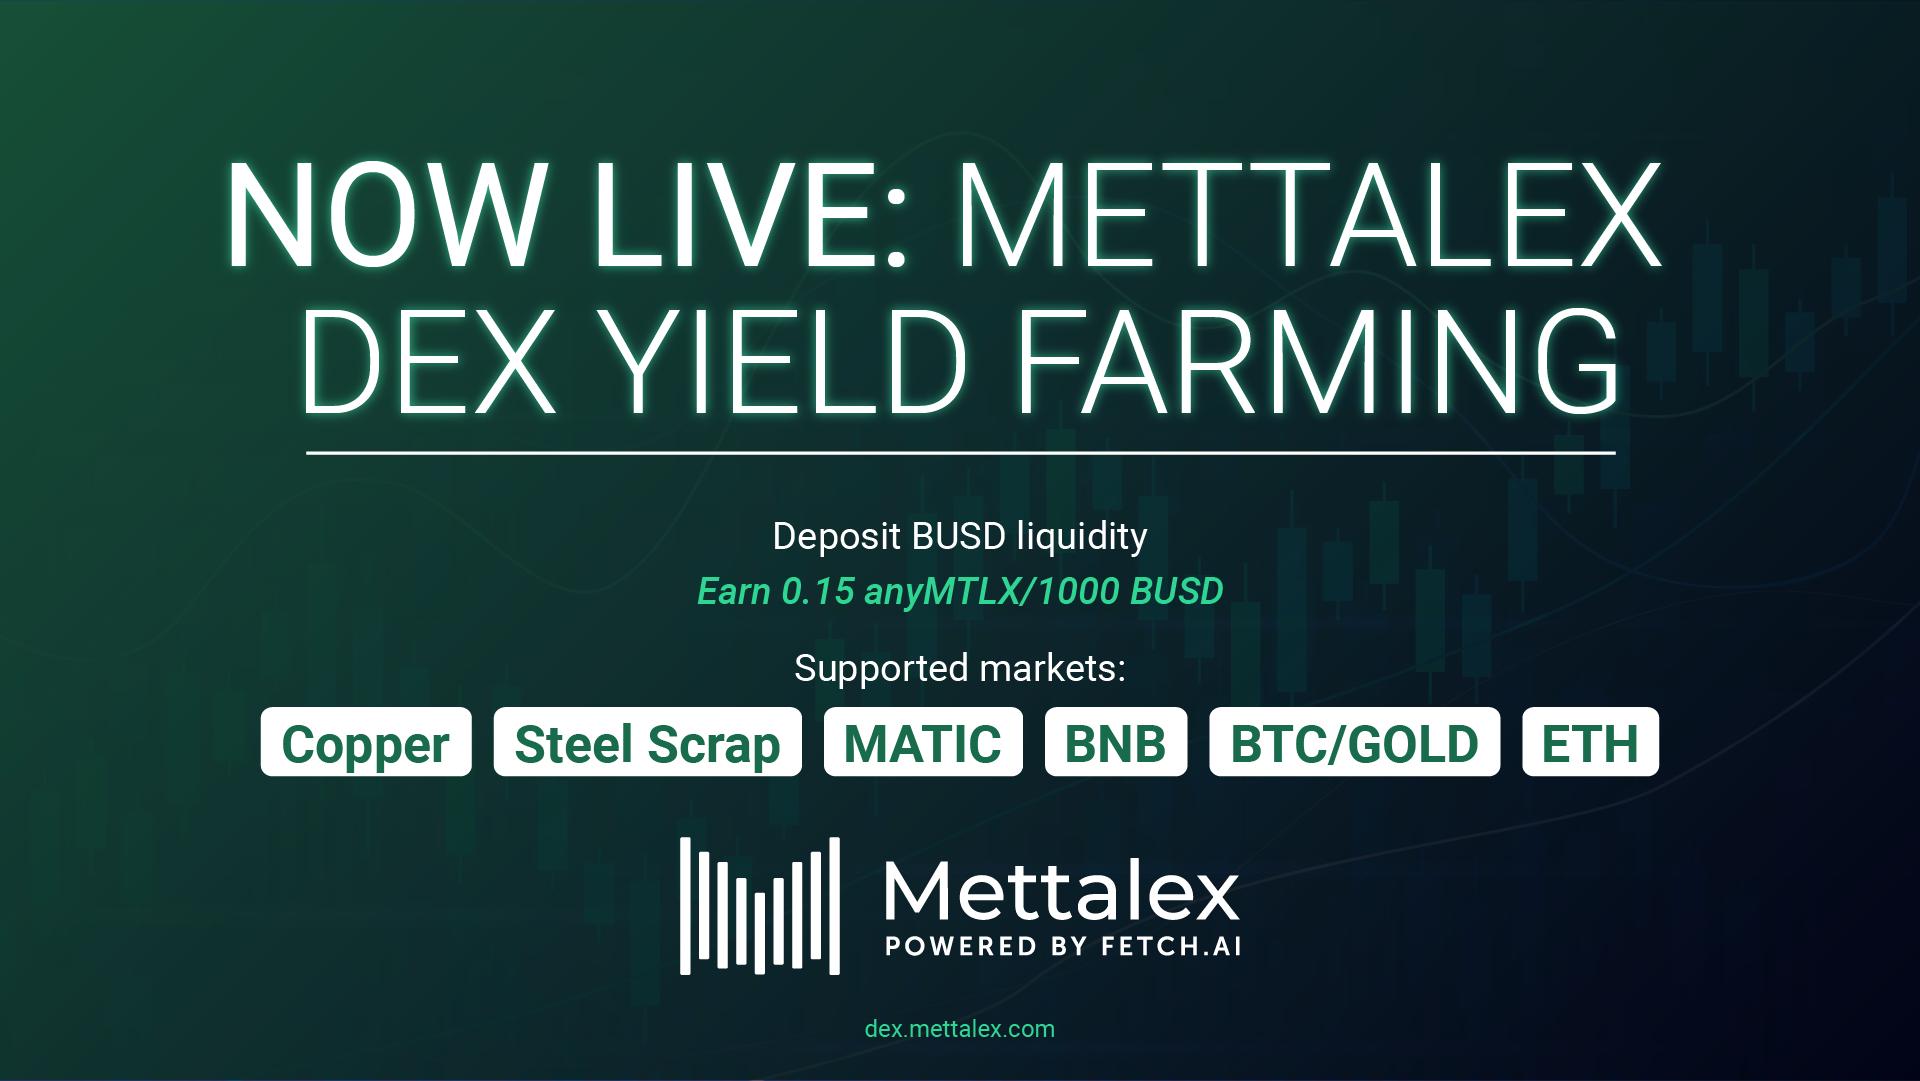 https://mettalex.com/wp-content/uploads/Now-Live-Mettalex-DEX-Yield-Farming.png